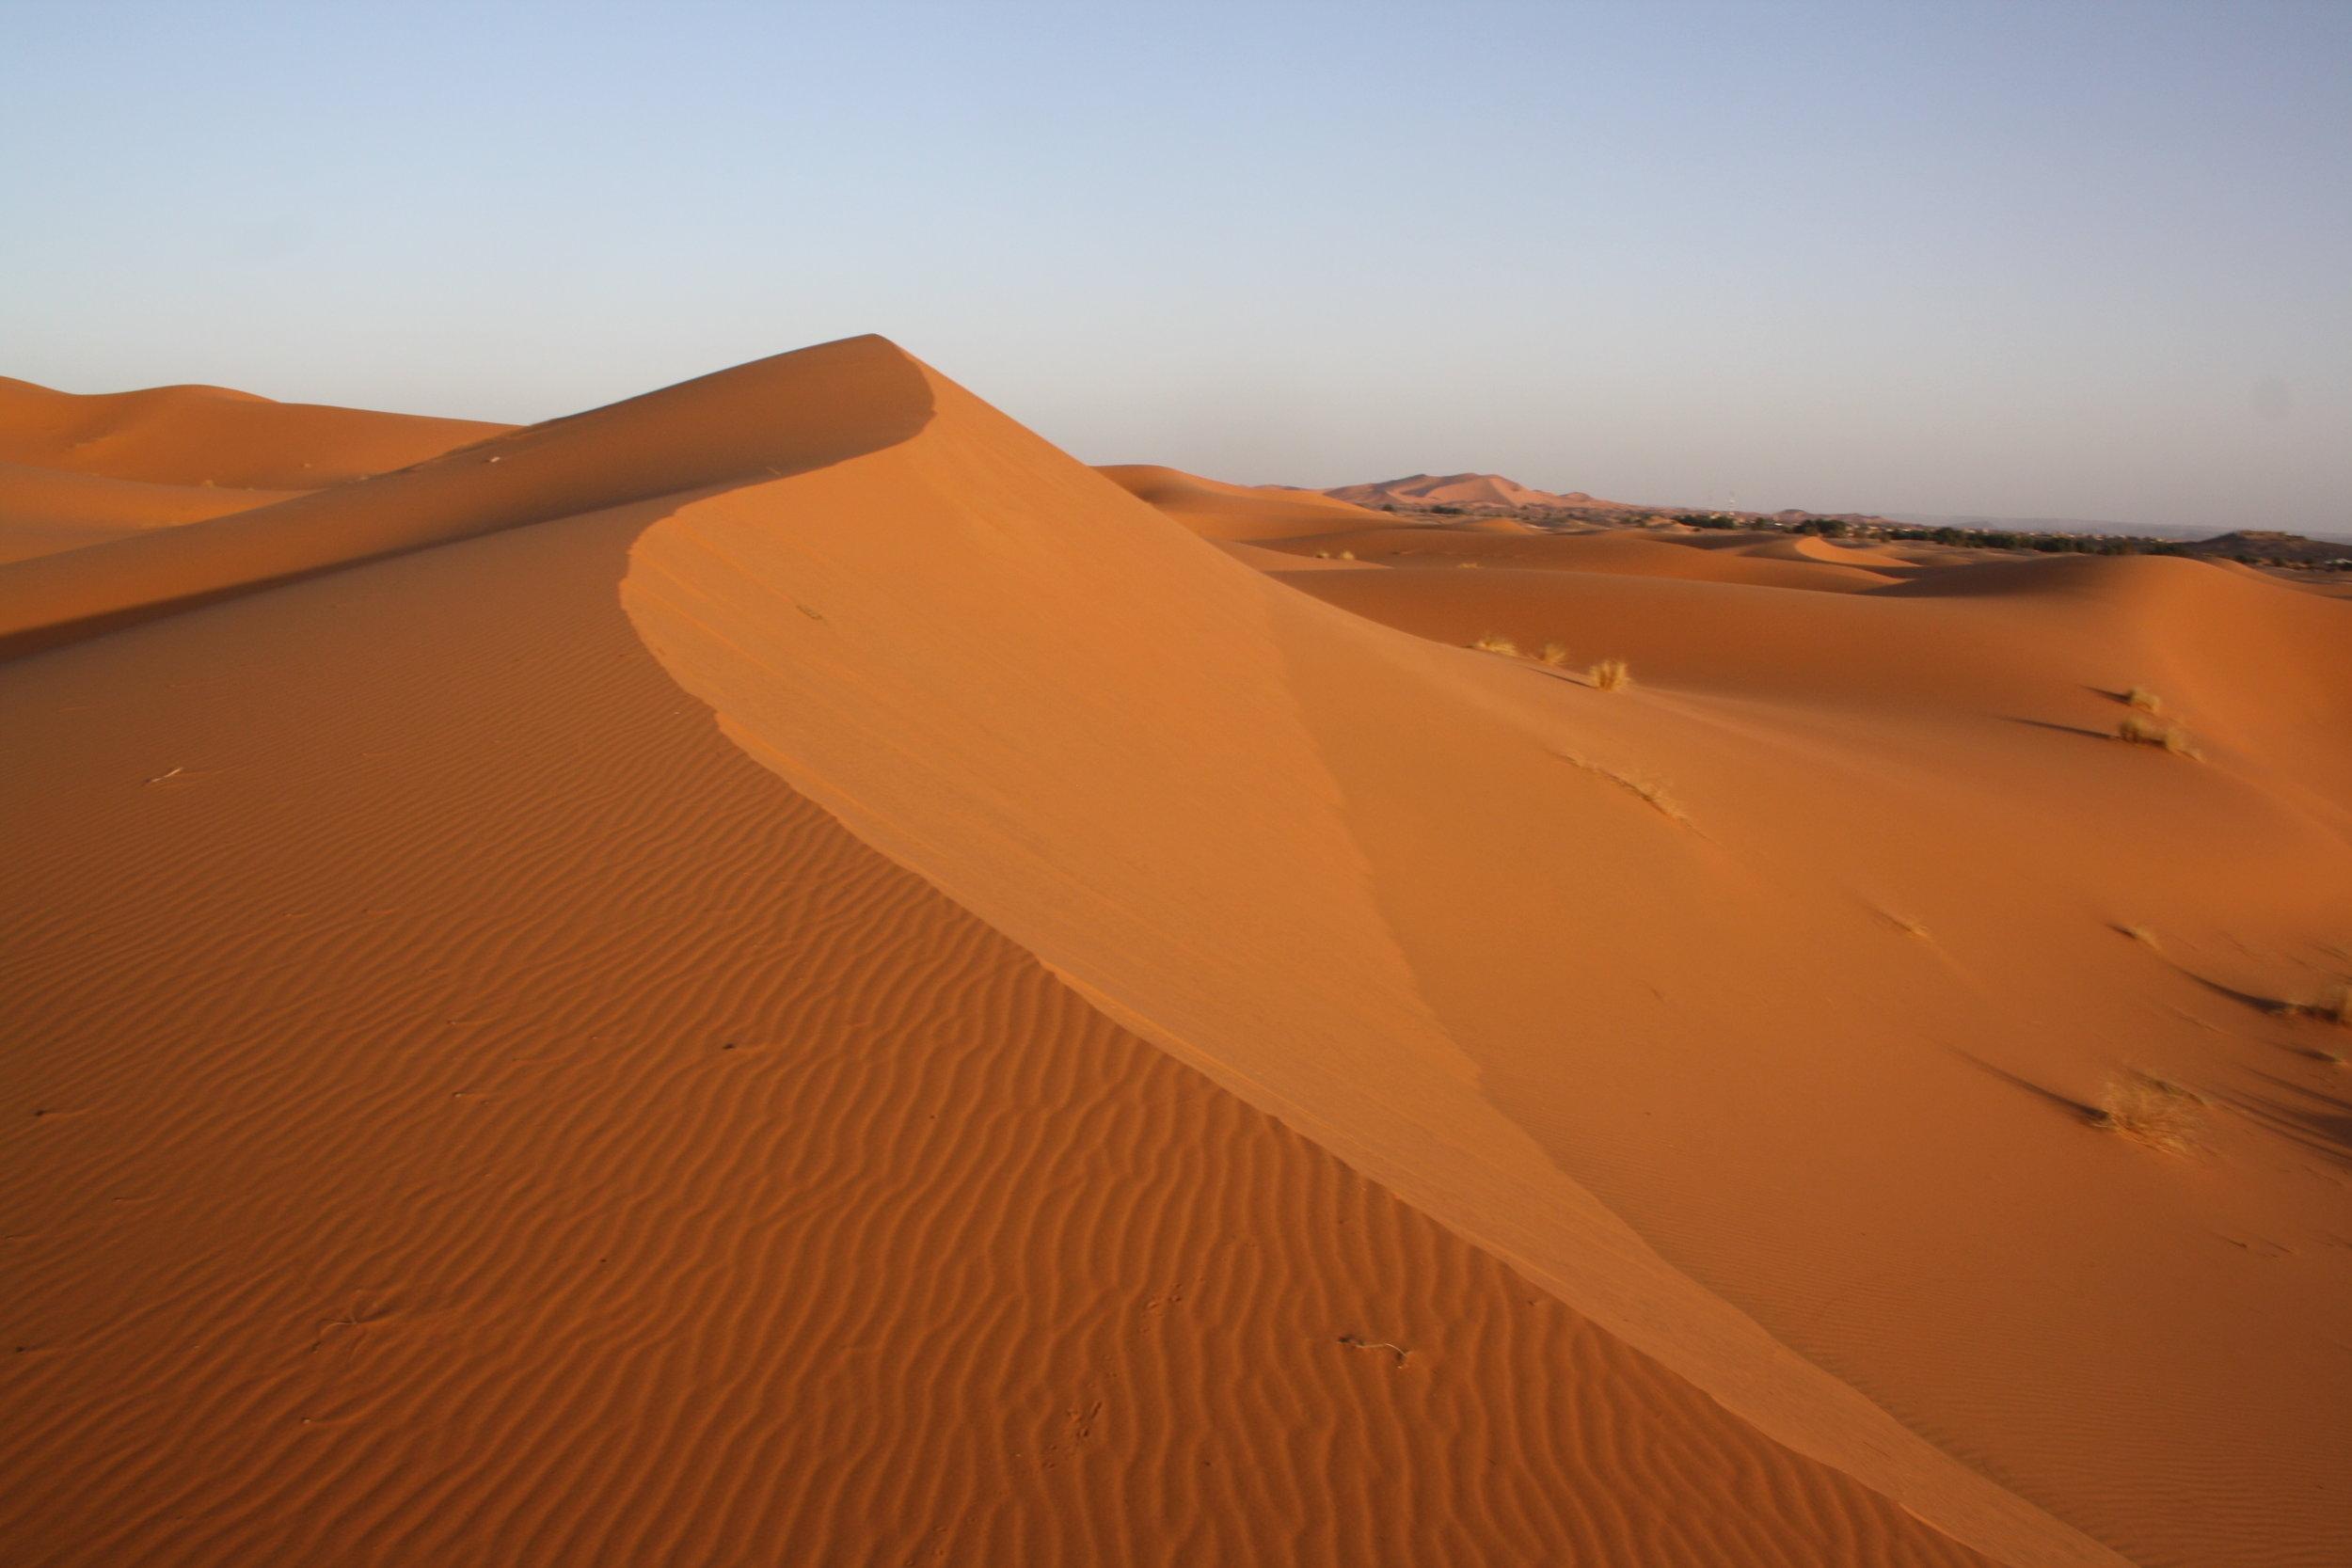 Morocco - Taking on Toubkal and the Sahara